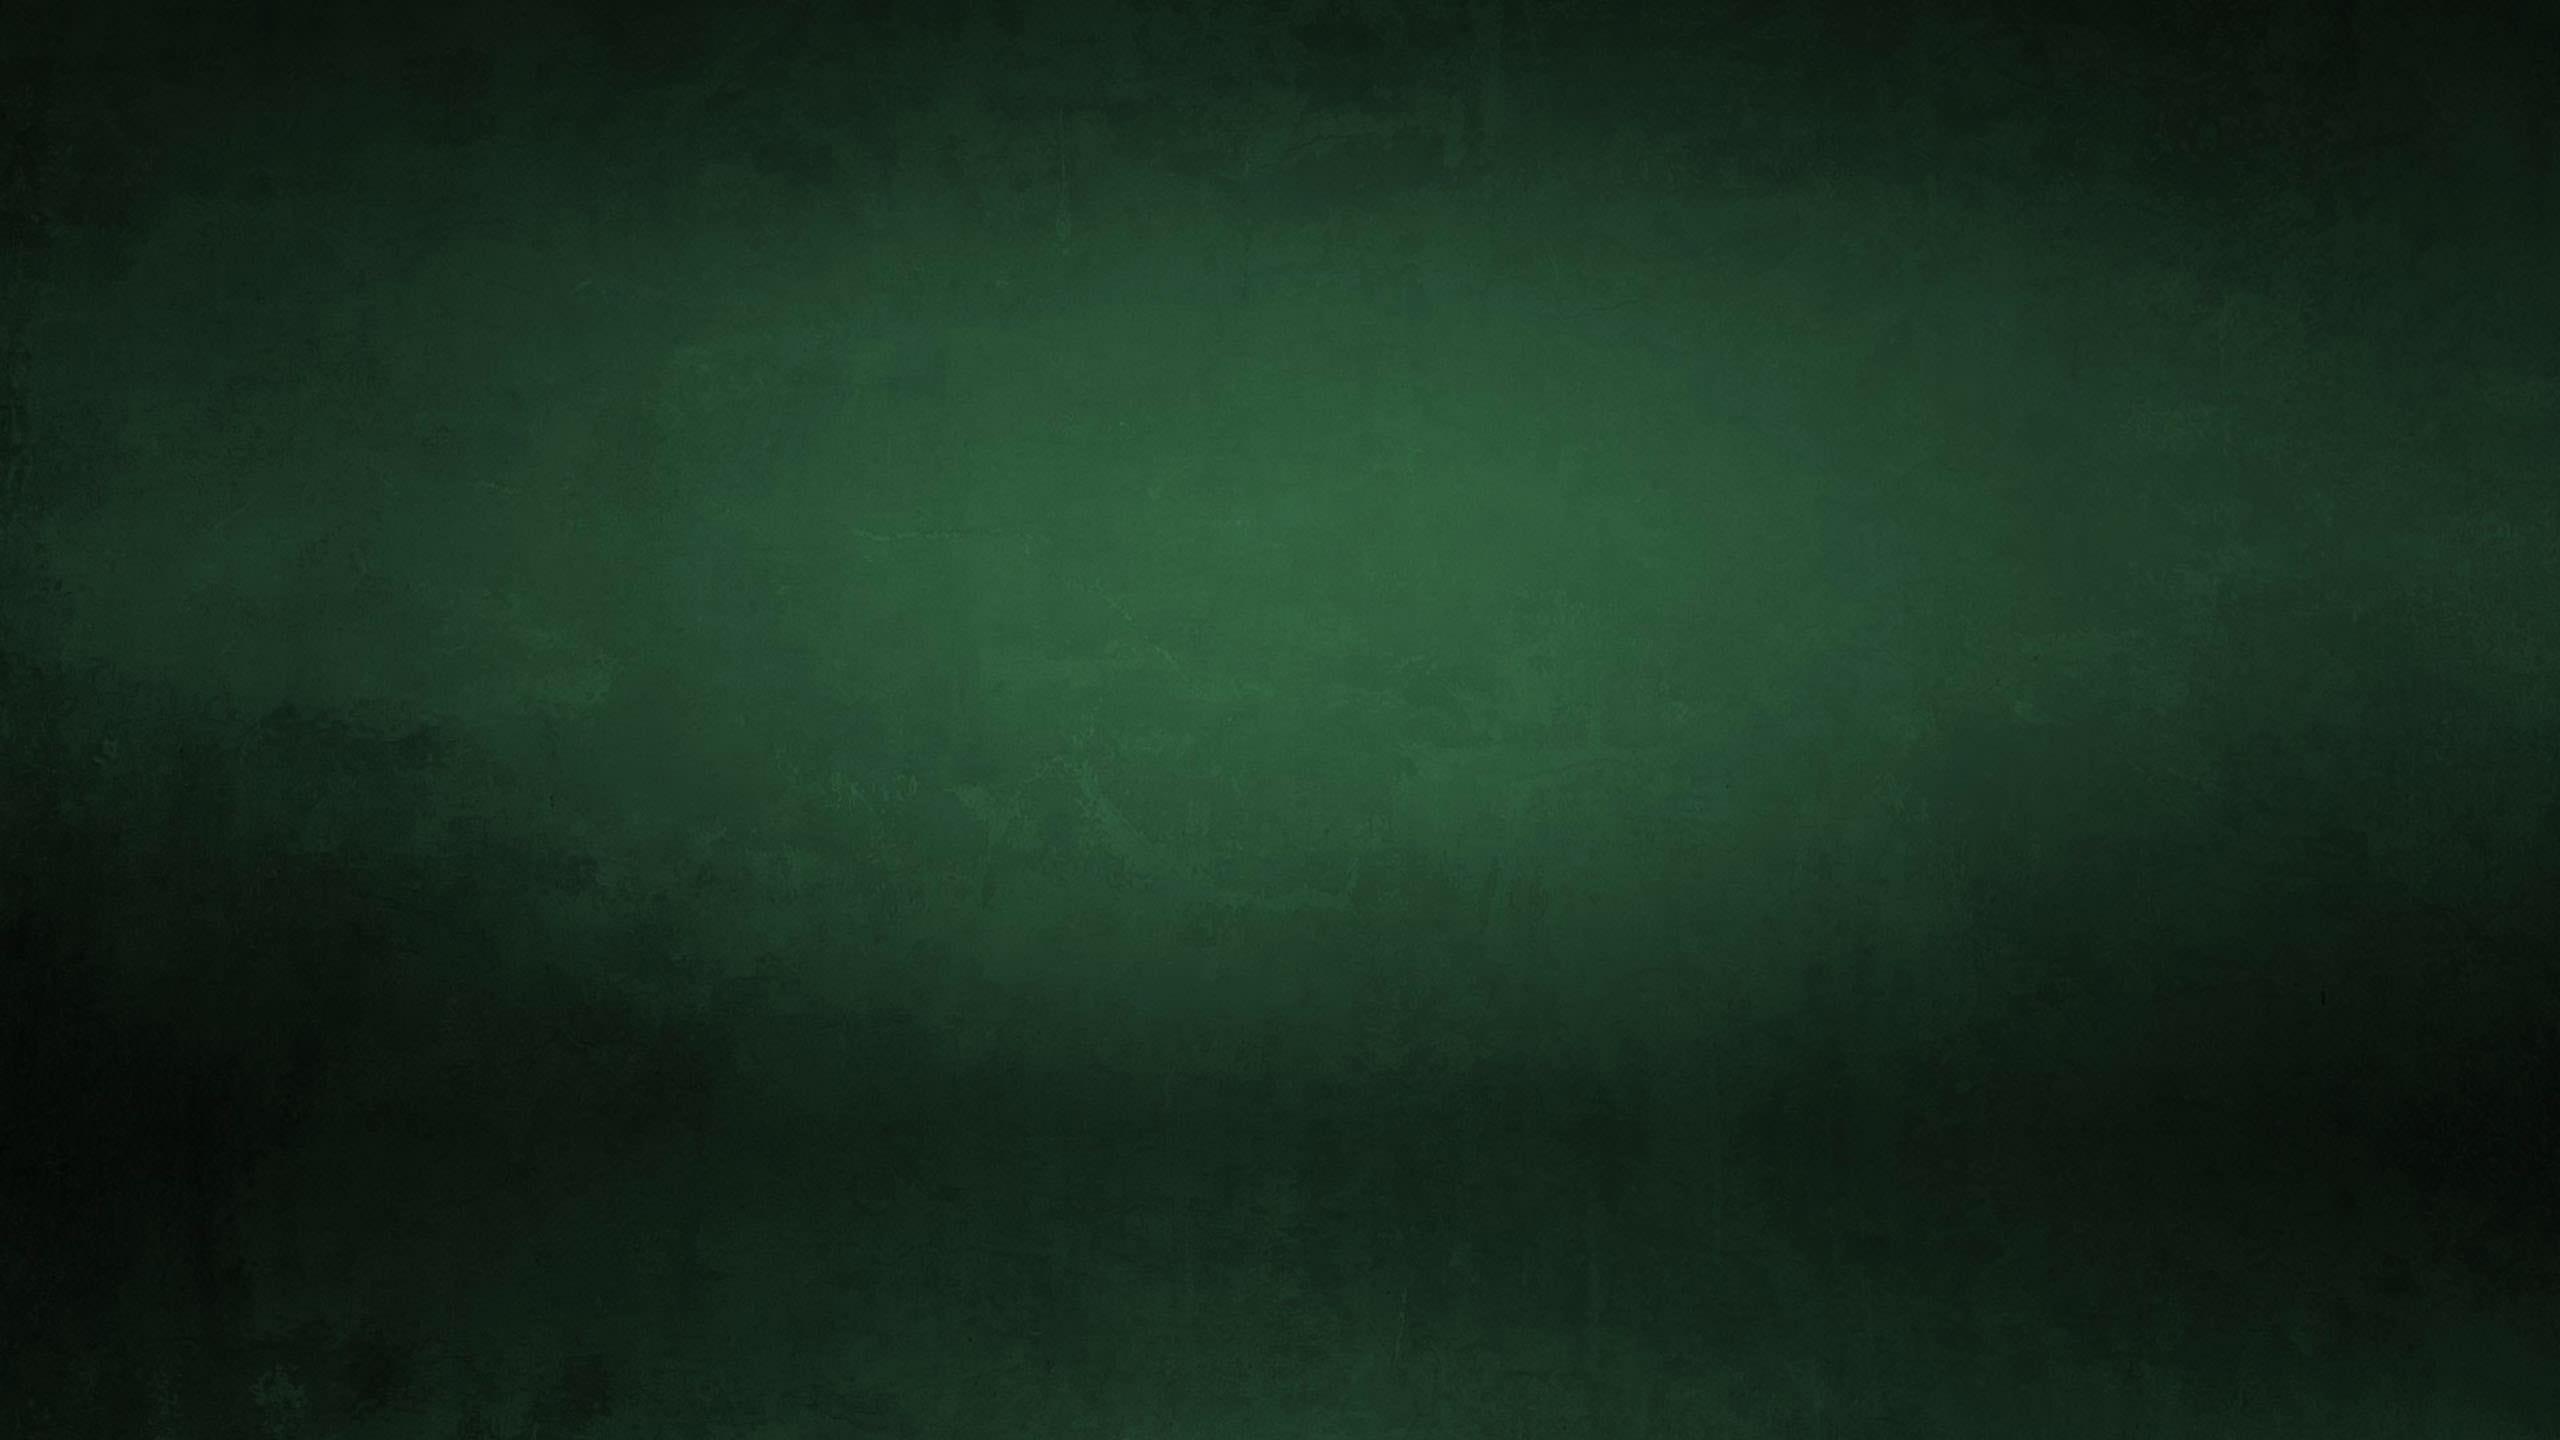 15 green grunge wallpapers freecreatives